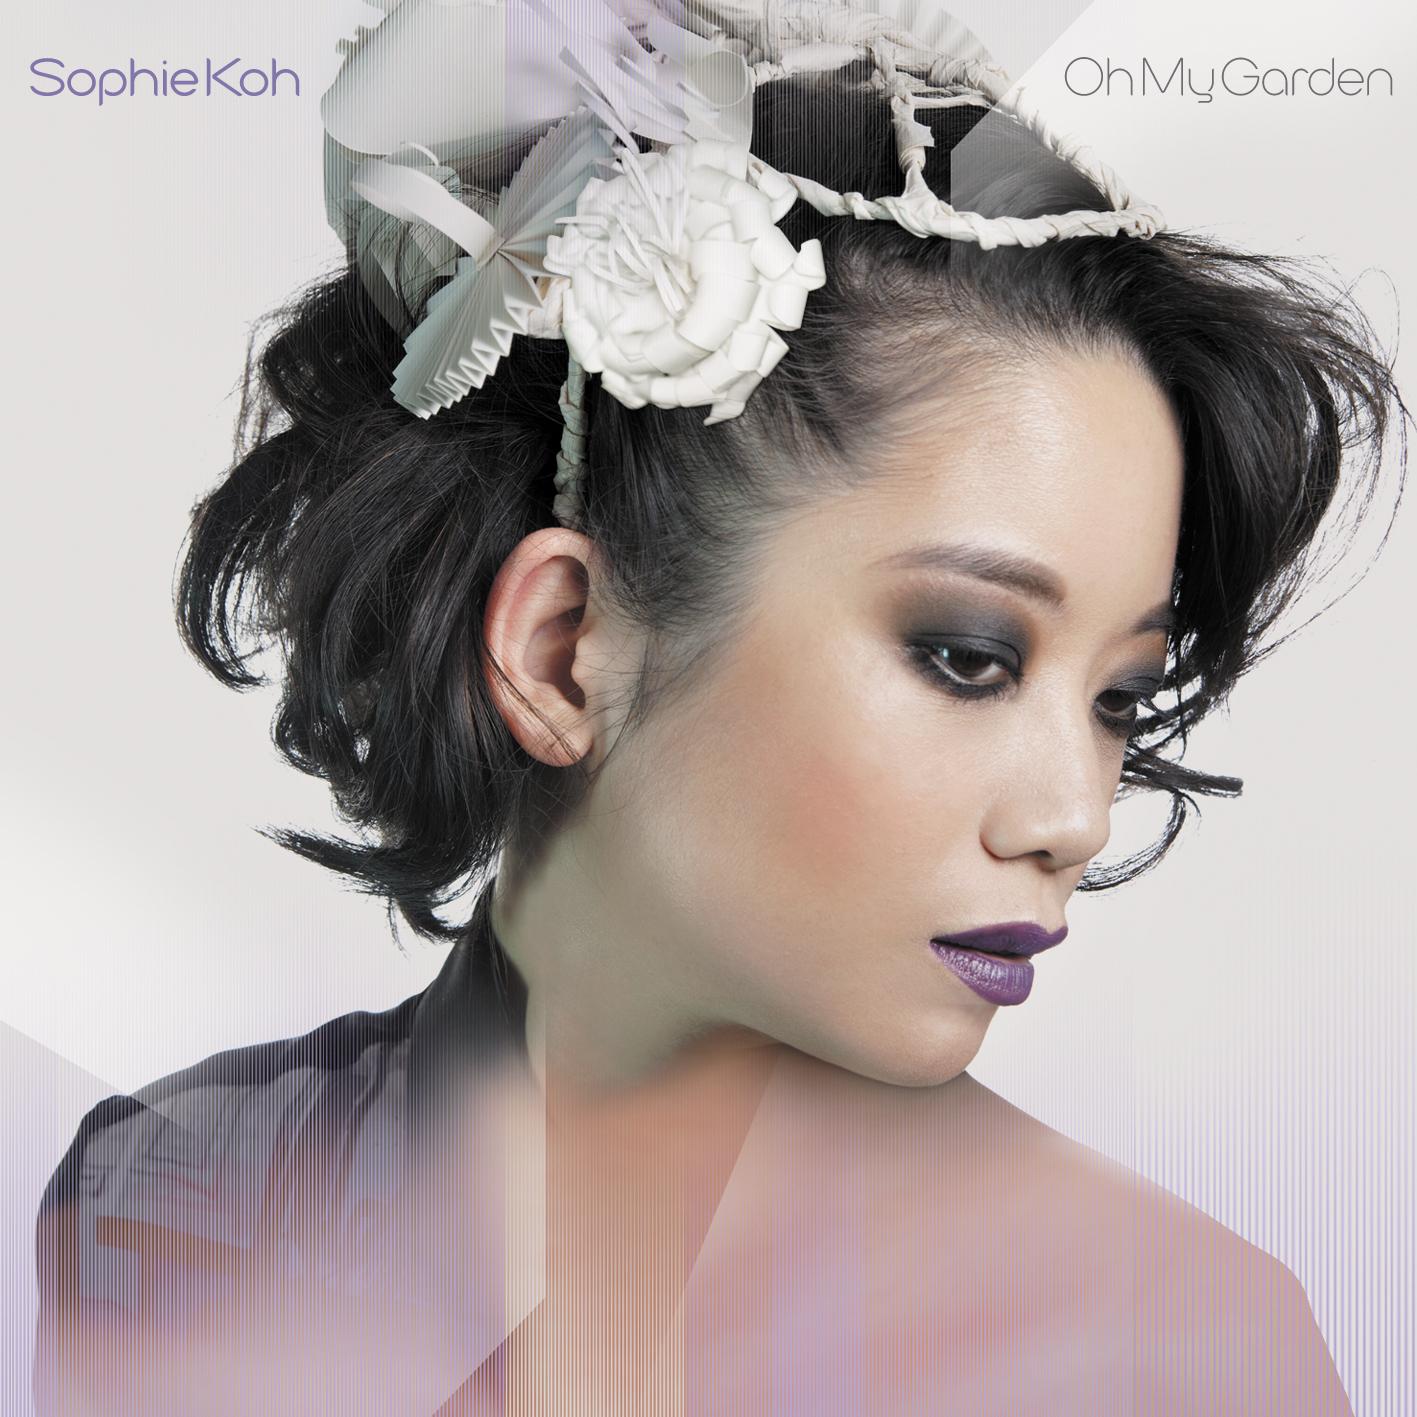 SK image A_Oh My Garden Album Cover HI Res.jpg